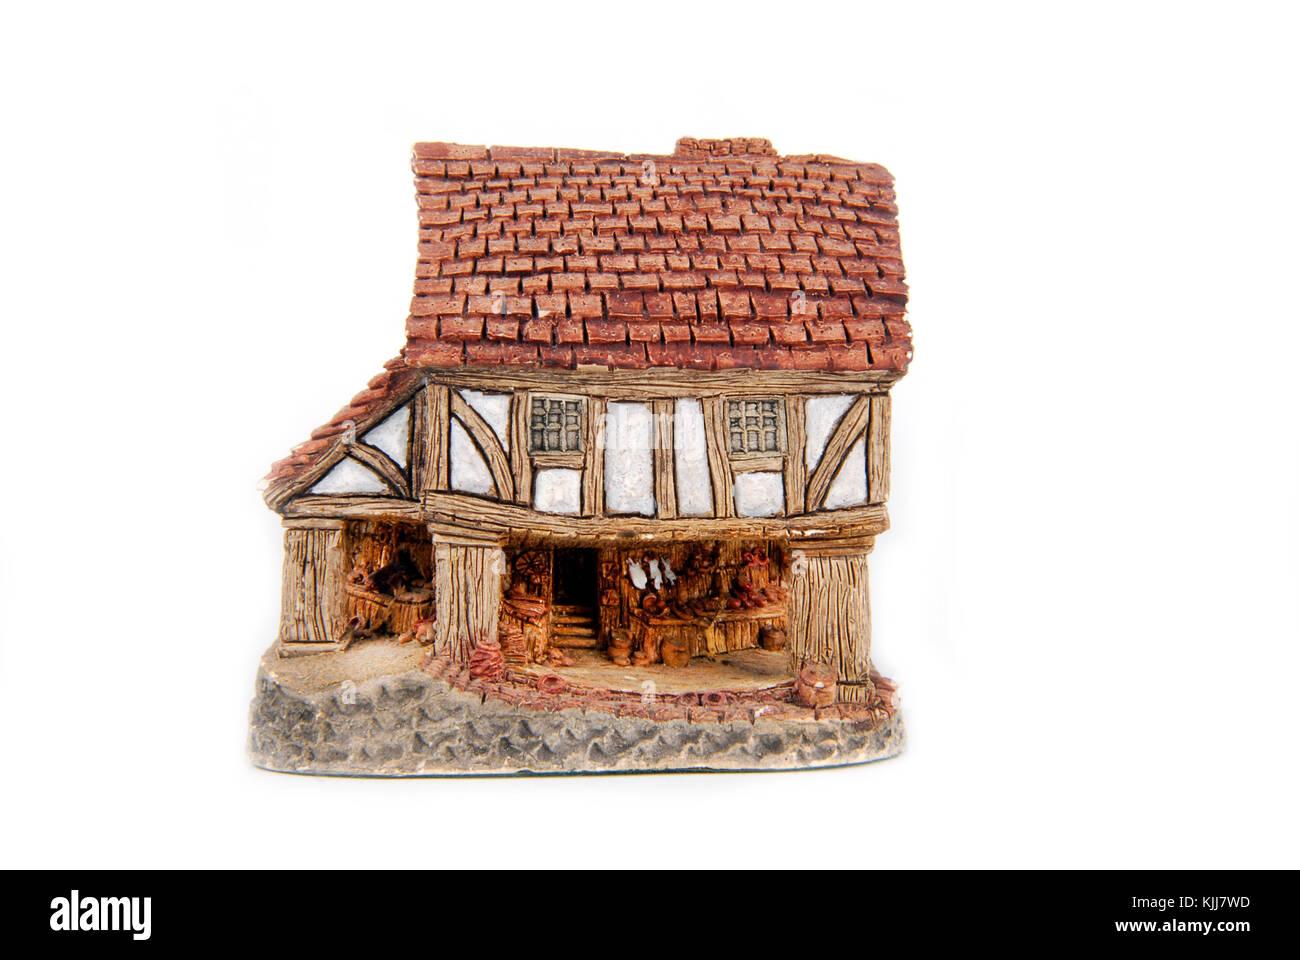 miniature house isolated on white - Stock Image